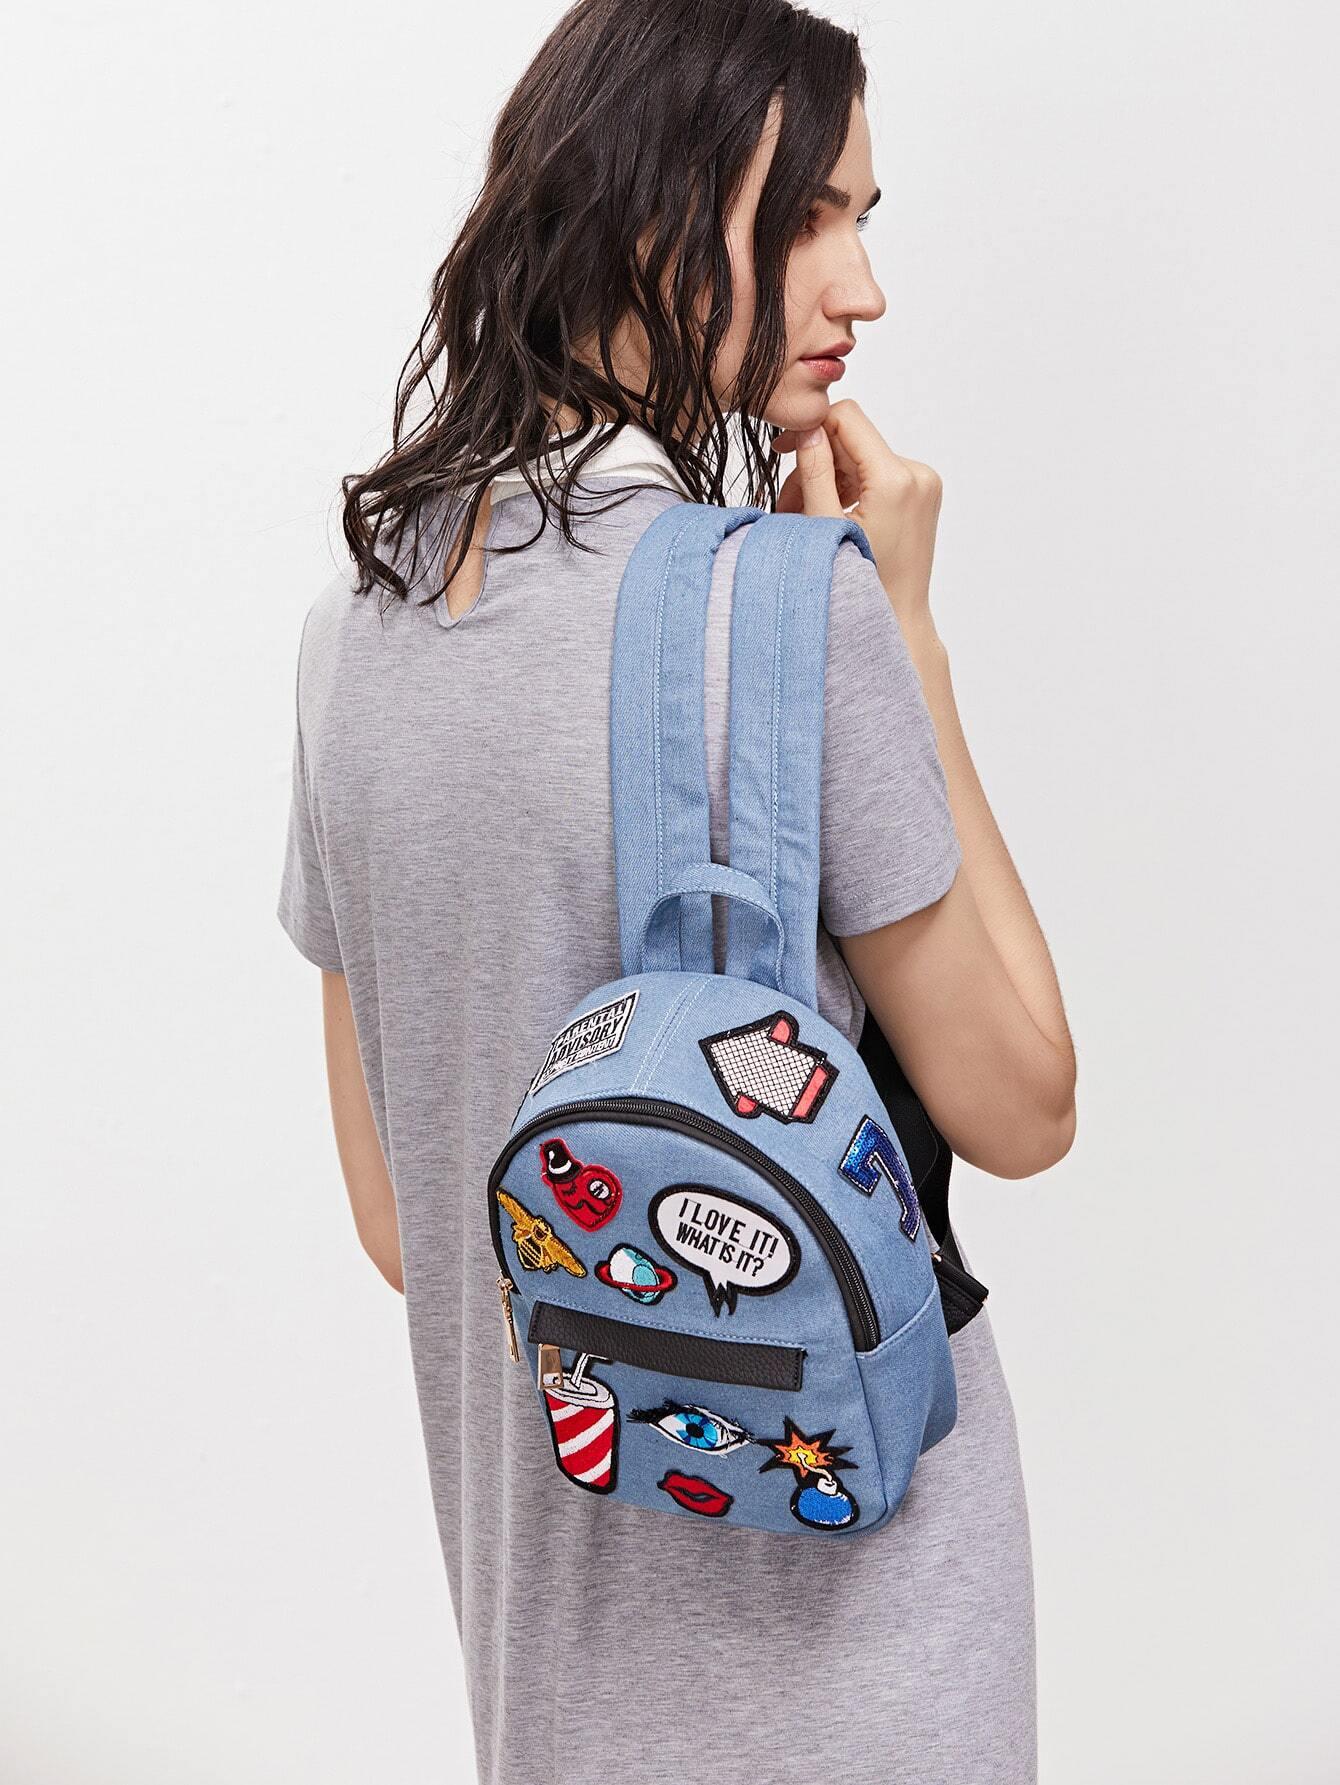 bag161230901_2